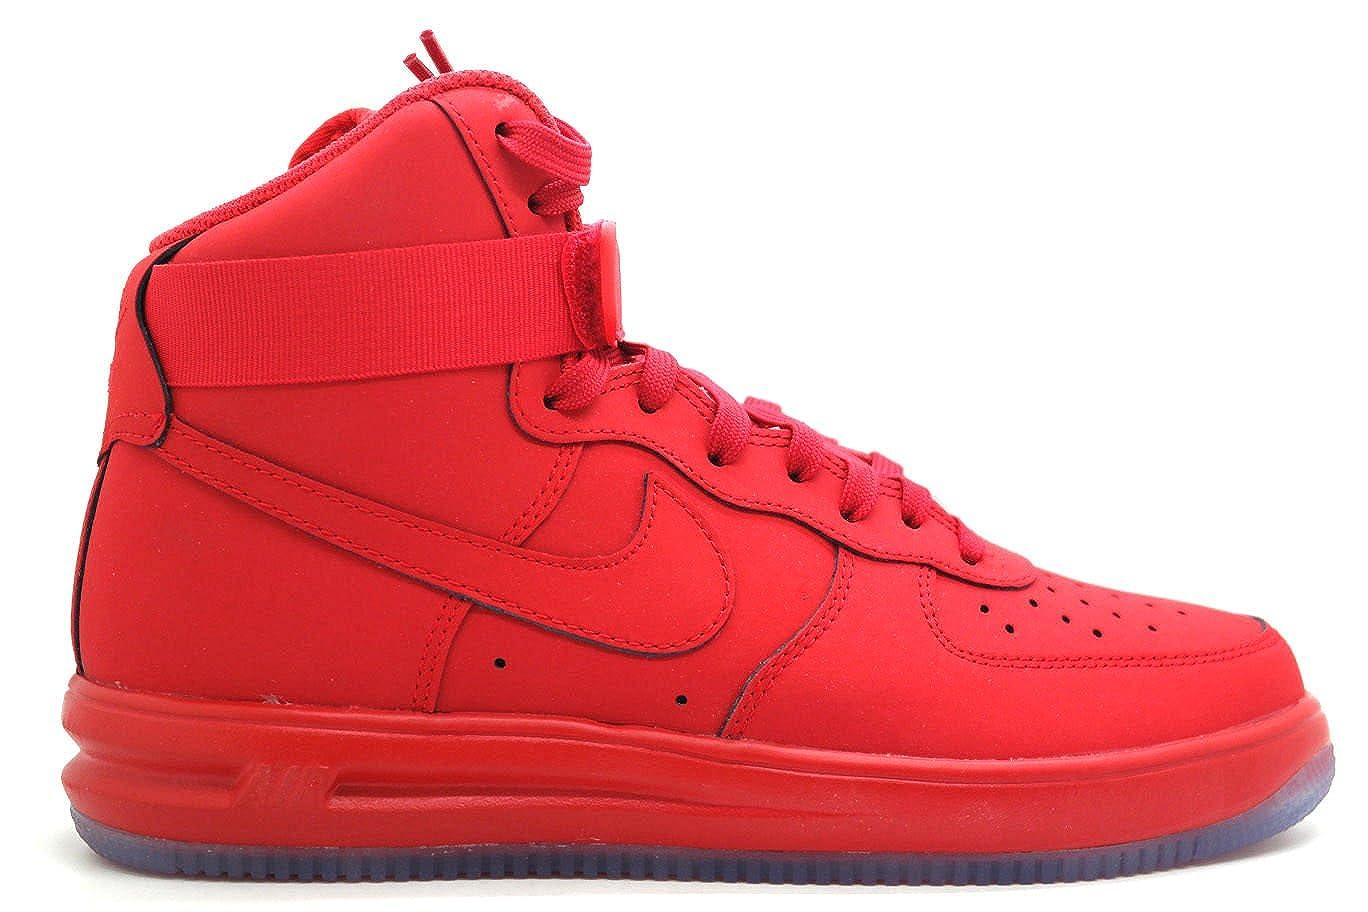 Amazon.com | NIKE Lunar Force 1 HI 14 Mens hi top Trainers 705436 Sneakers Shoes | Fashion Sneakers